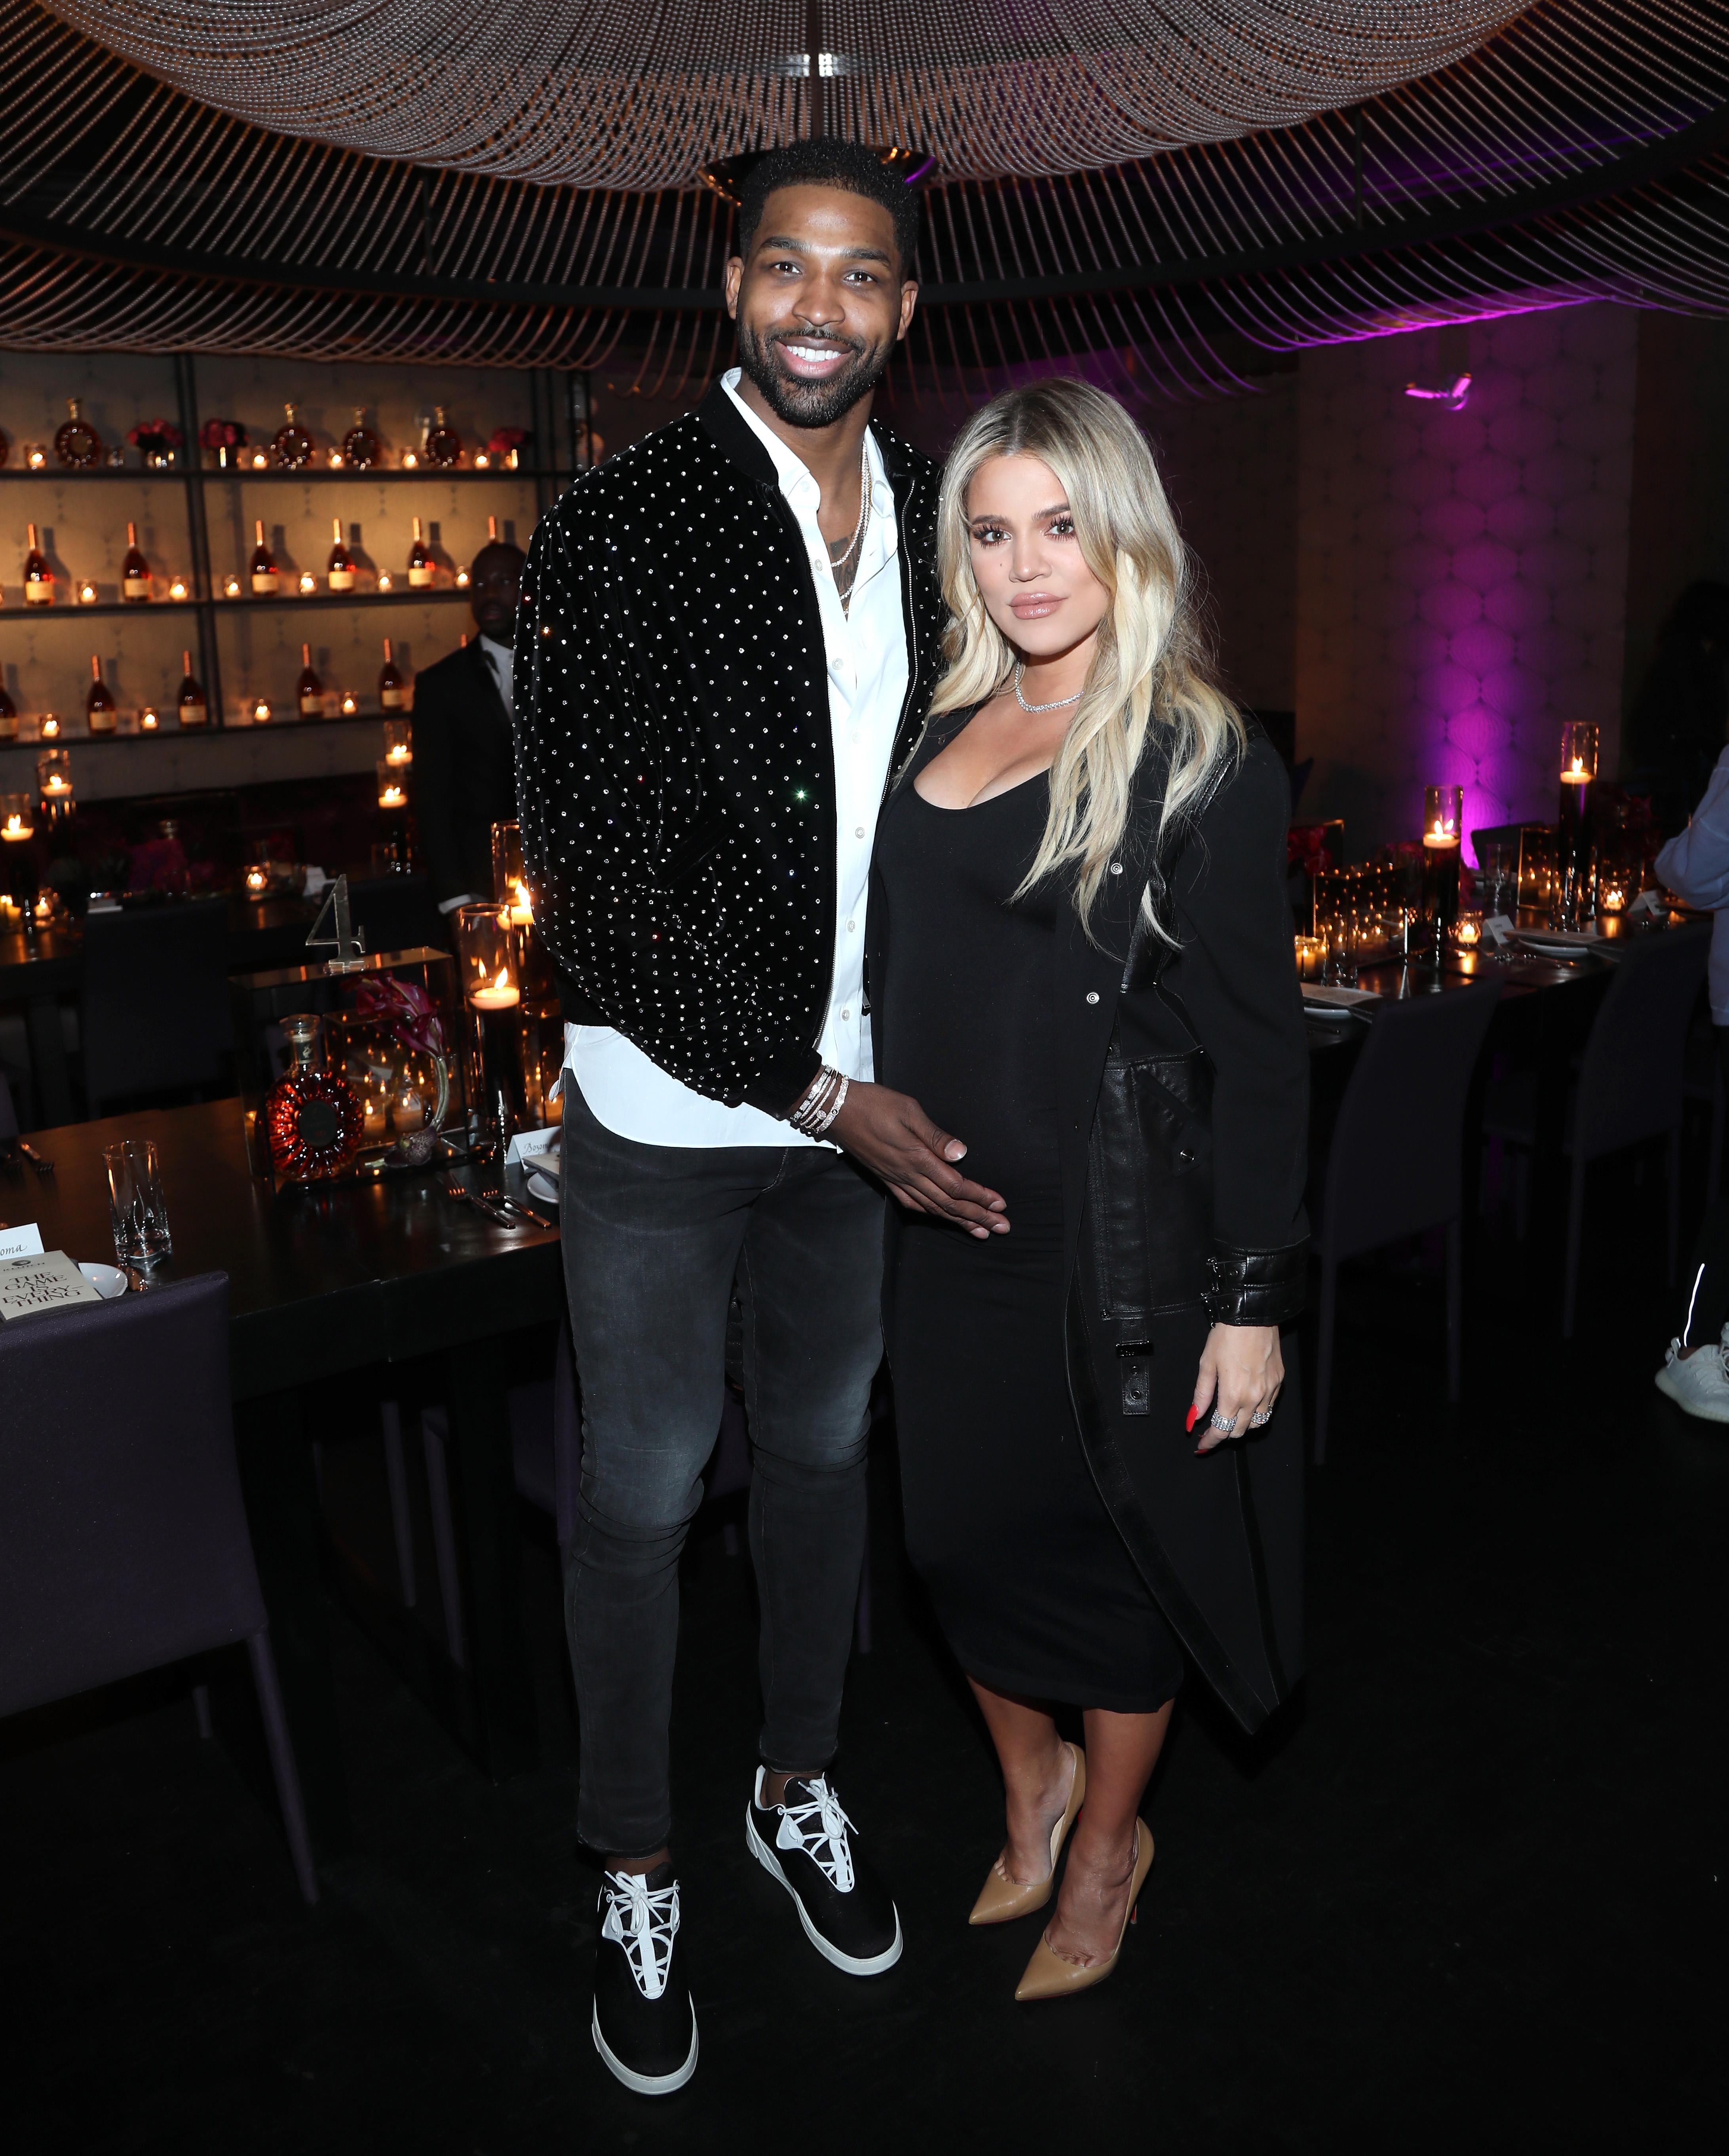 Khloé-Kardashian-Tristan-Thompson-Look-Loved-Up-At-NBA-All-Stars-Dinner